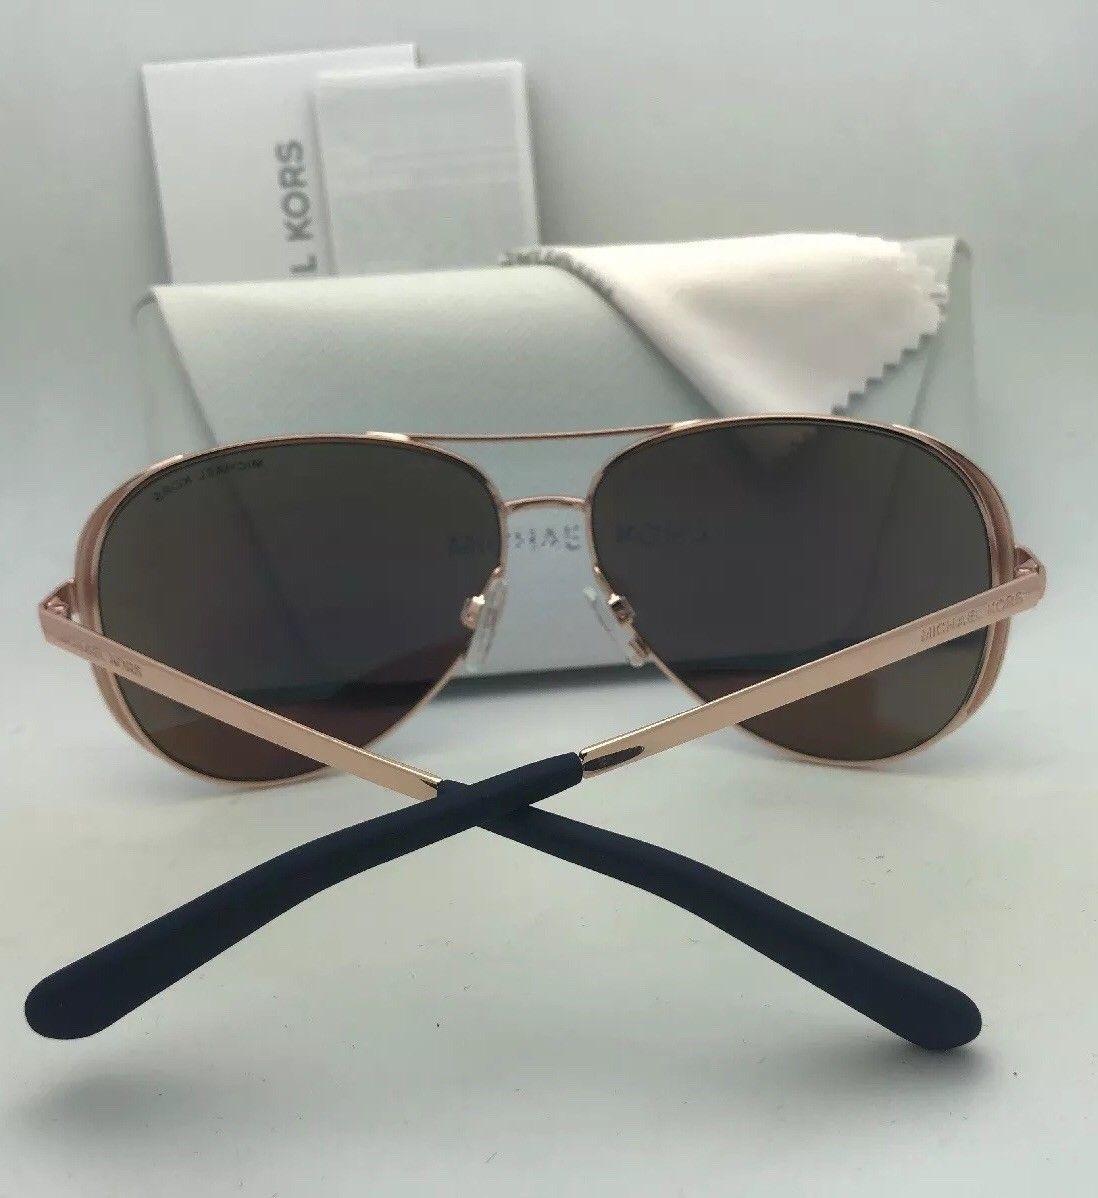 Polarized MICHAEL KORS Sunglasses CHELSEA MK 5004 1014T5 Gold Brown w/ Brown